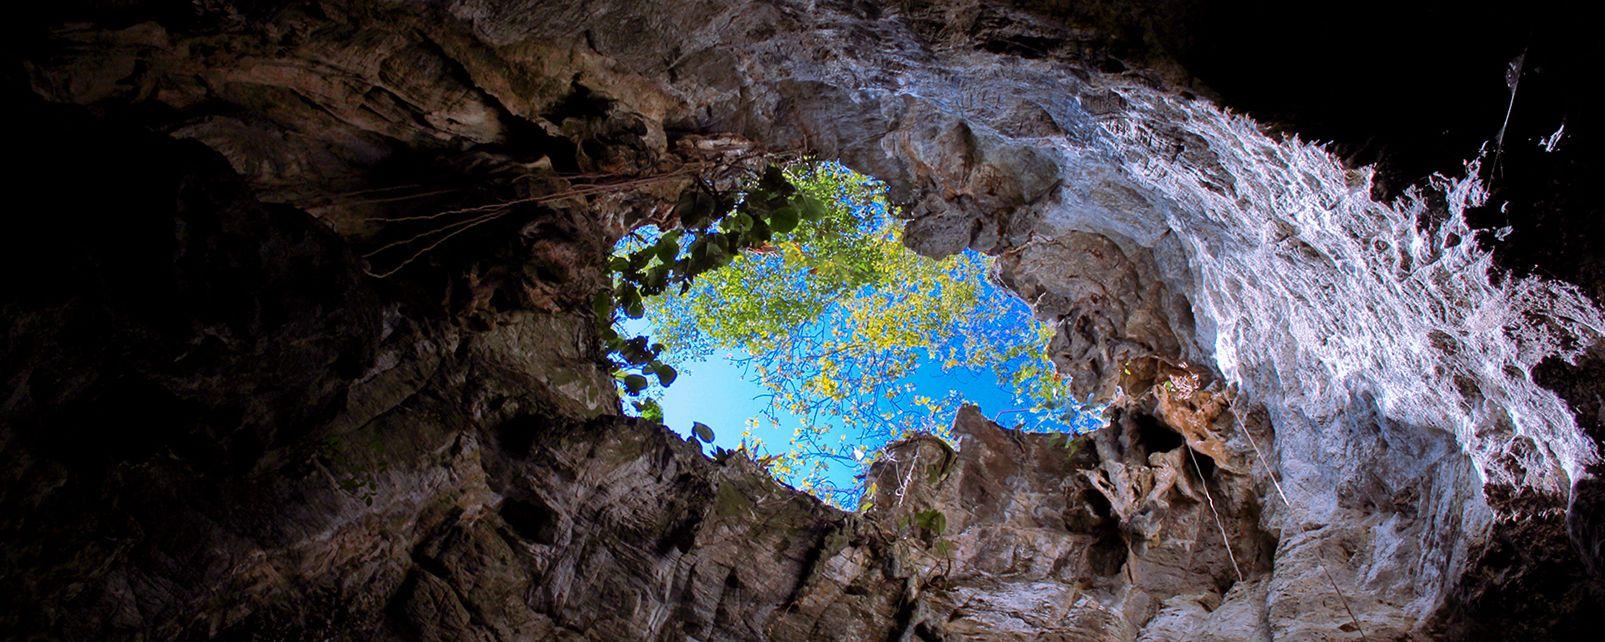 las-cuevas-de-Tahiti-Nui